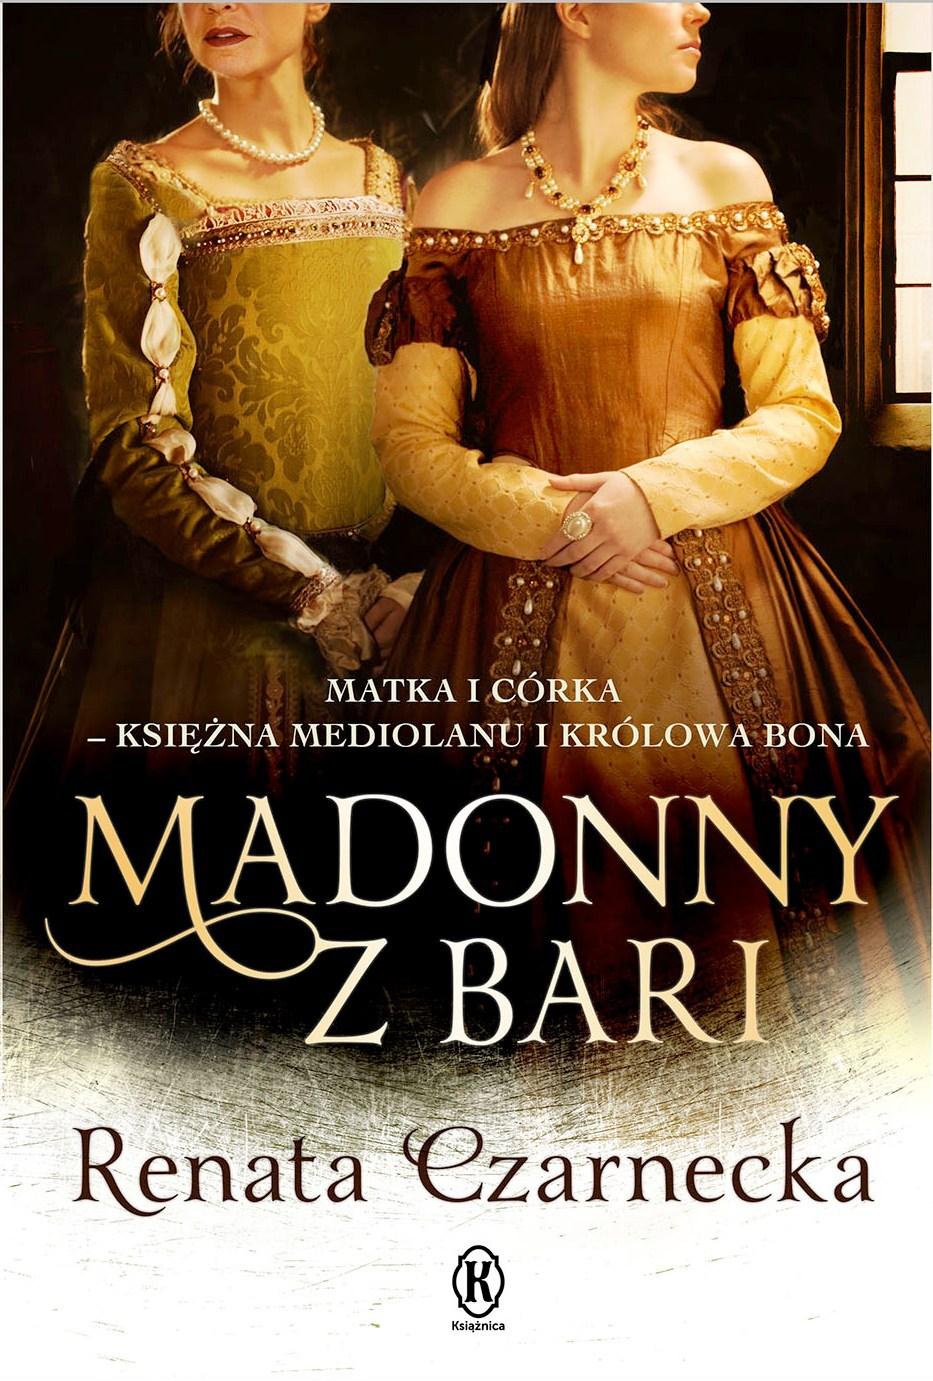 Madonny z Bari. Matka i córka - księżna Mediolanu i królowa Bona  by  Renata Czarnecka